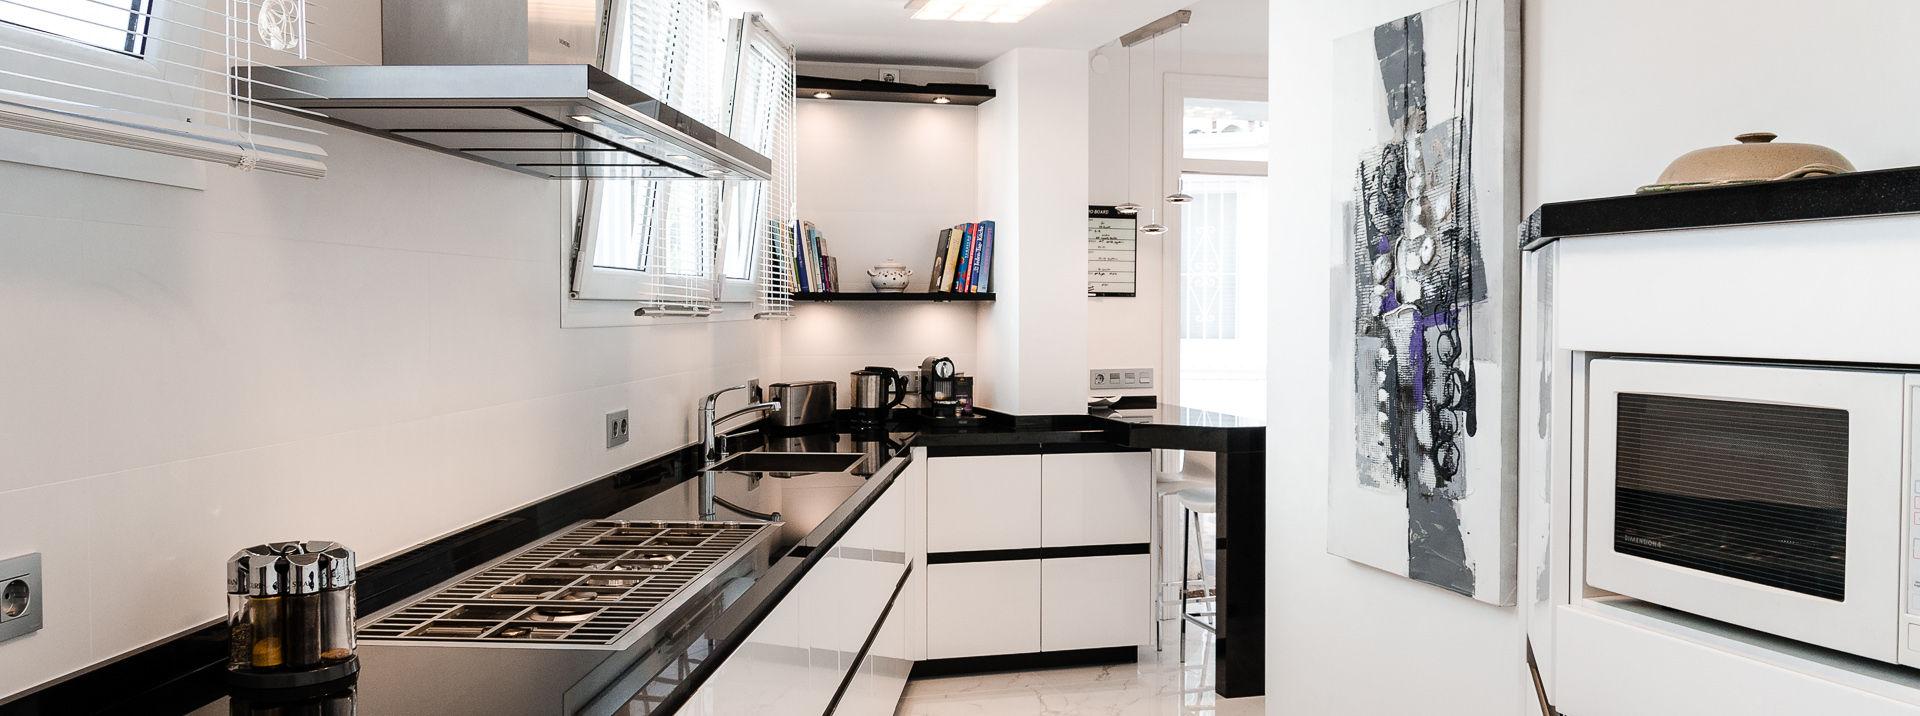 Nordic Muebles - Kitchens - Modern - Gante